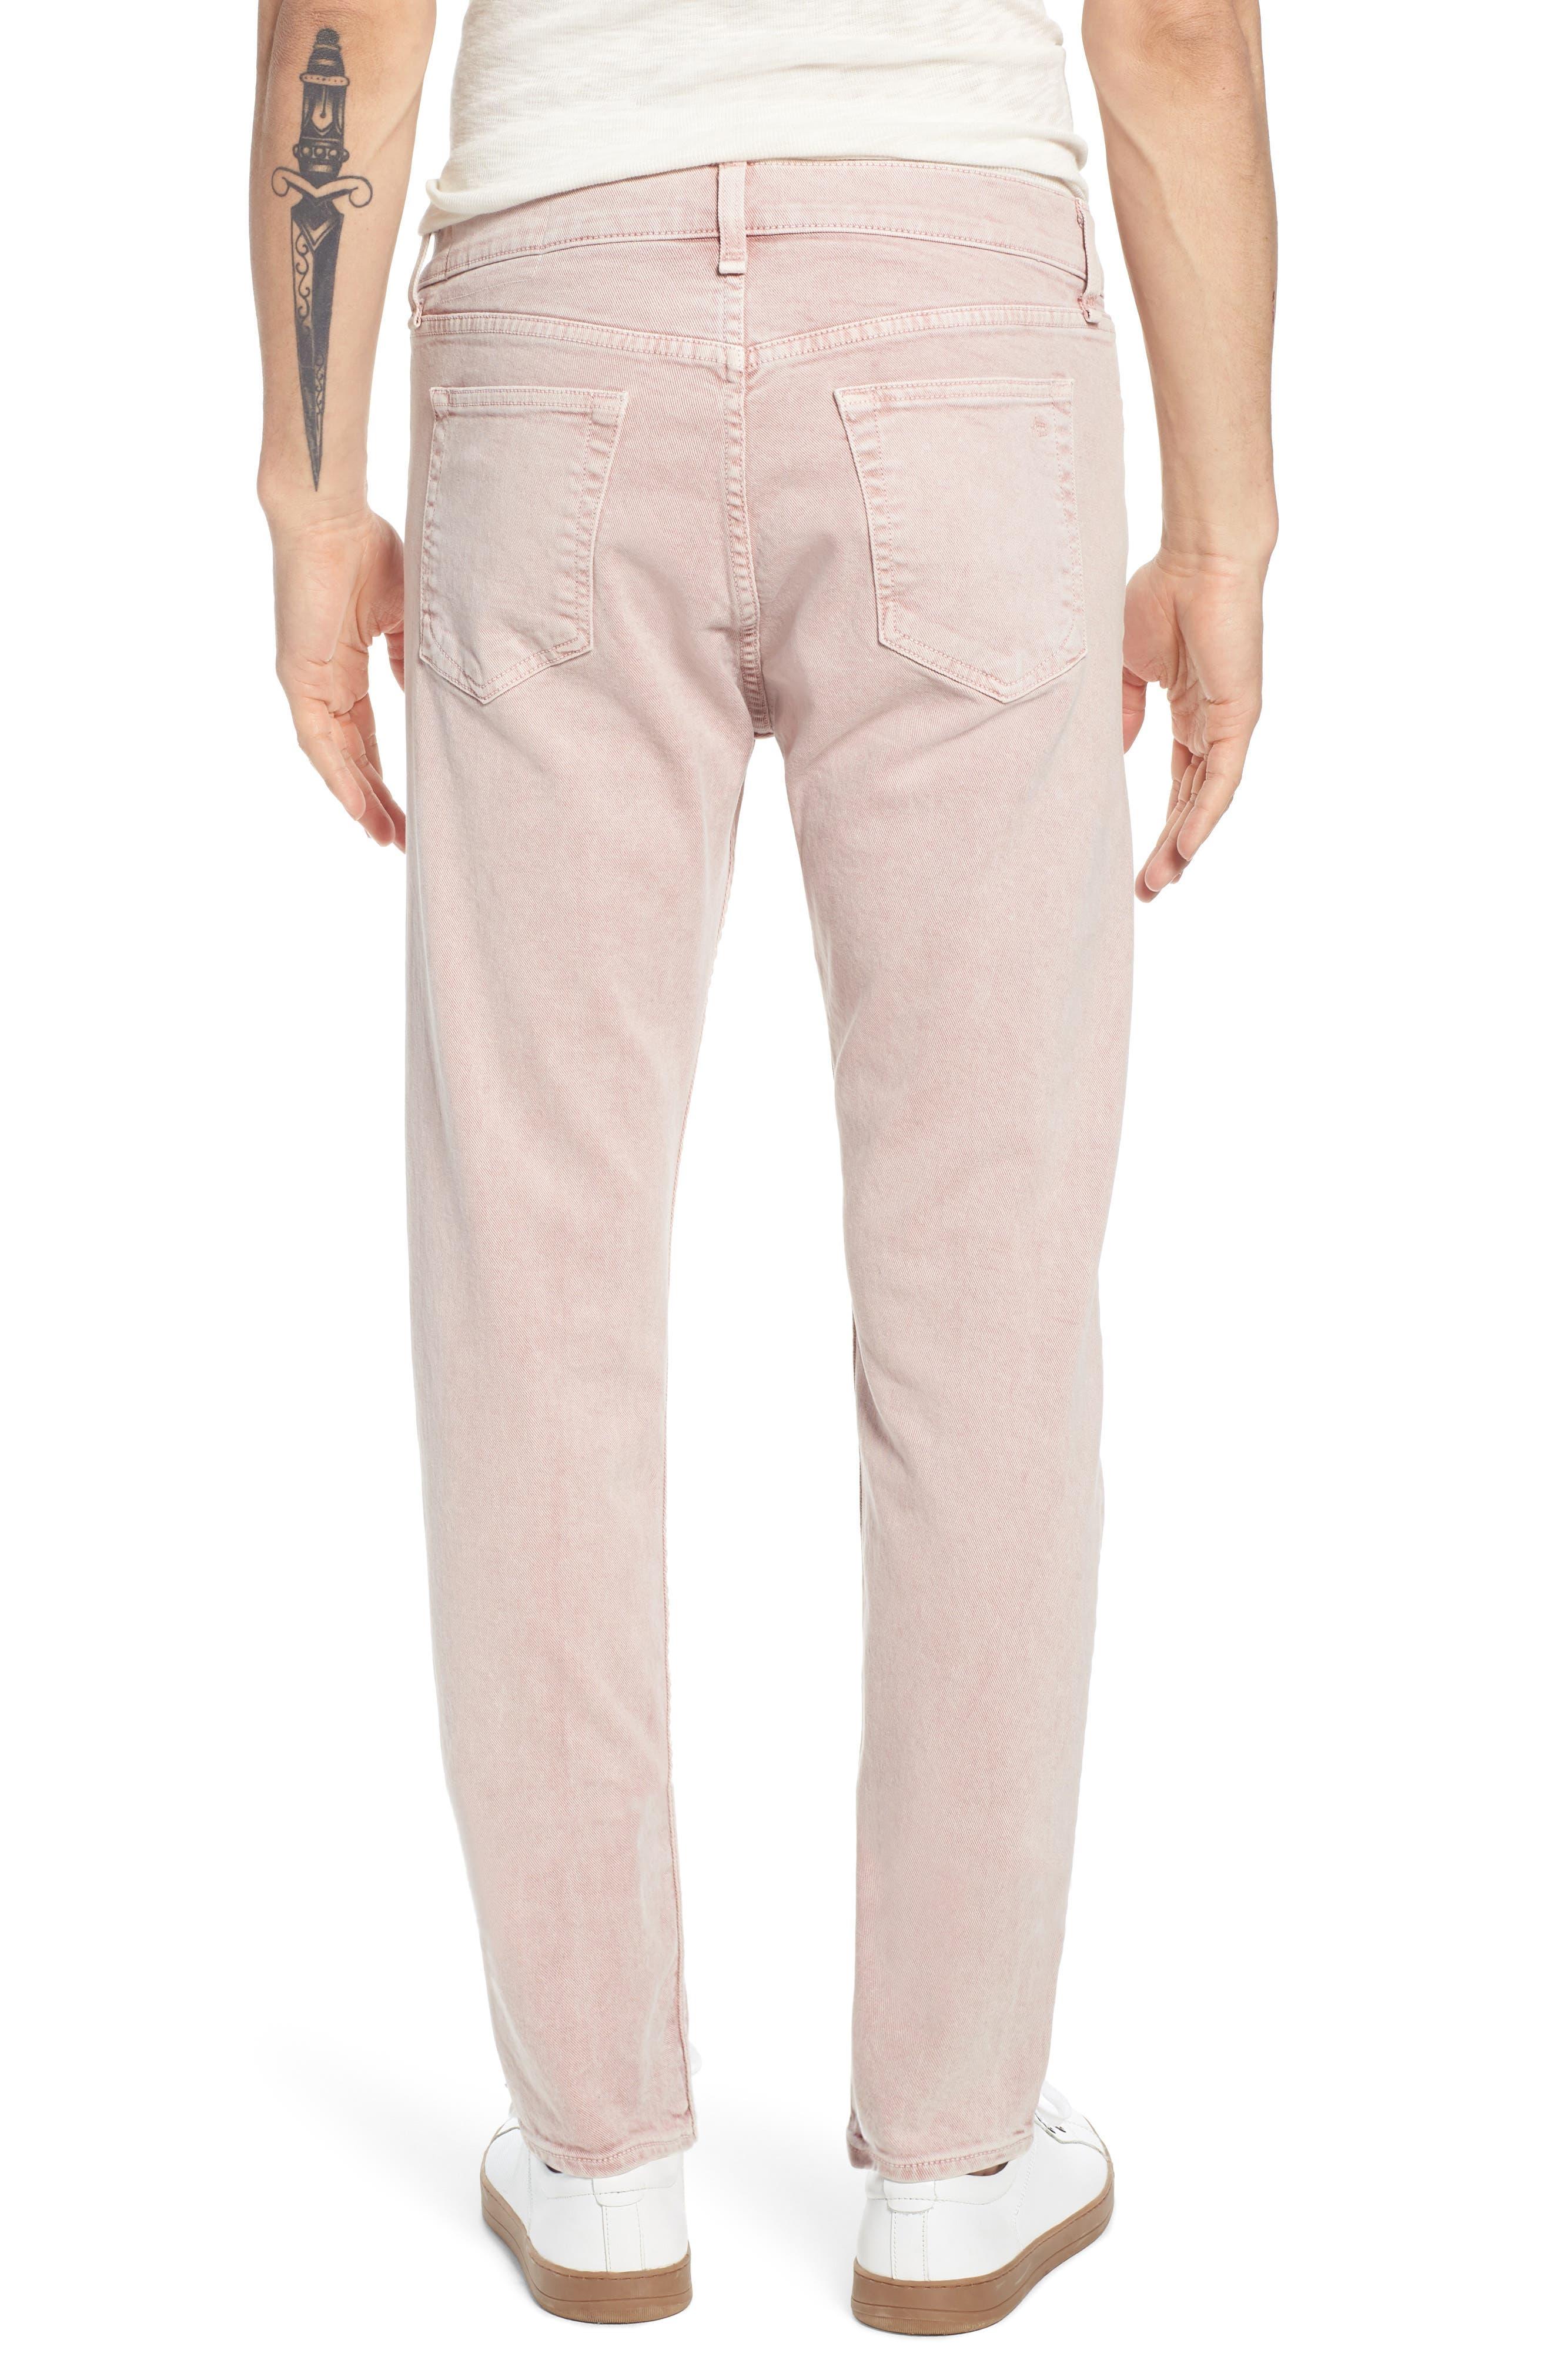 Fit 2 Slim Fit Jeans,                             Alternate thumbnail 2, color,                             BUD